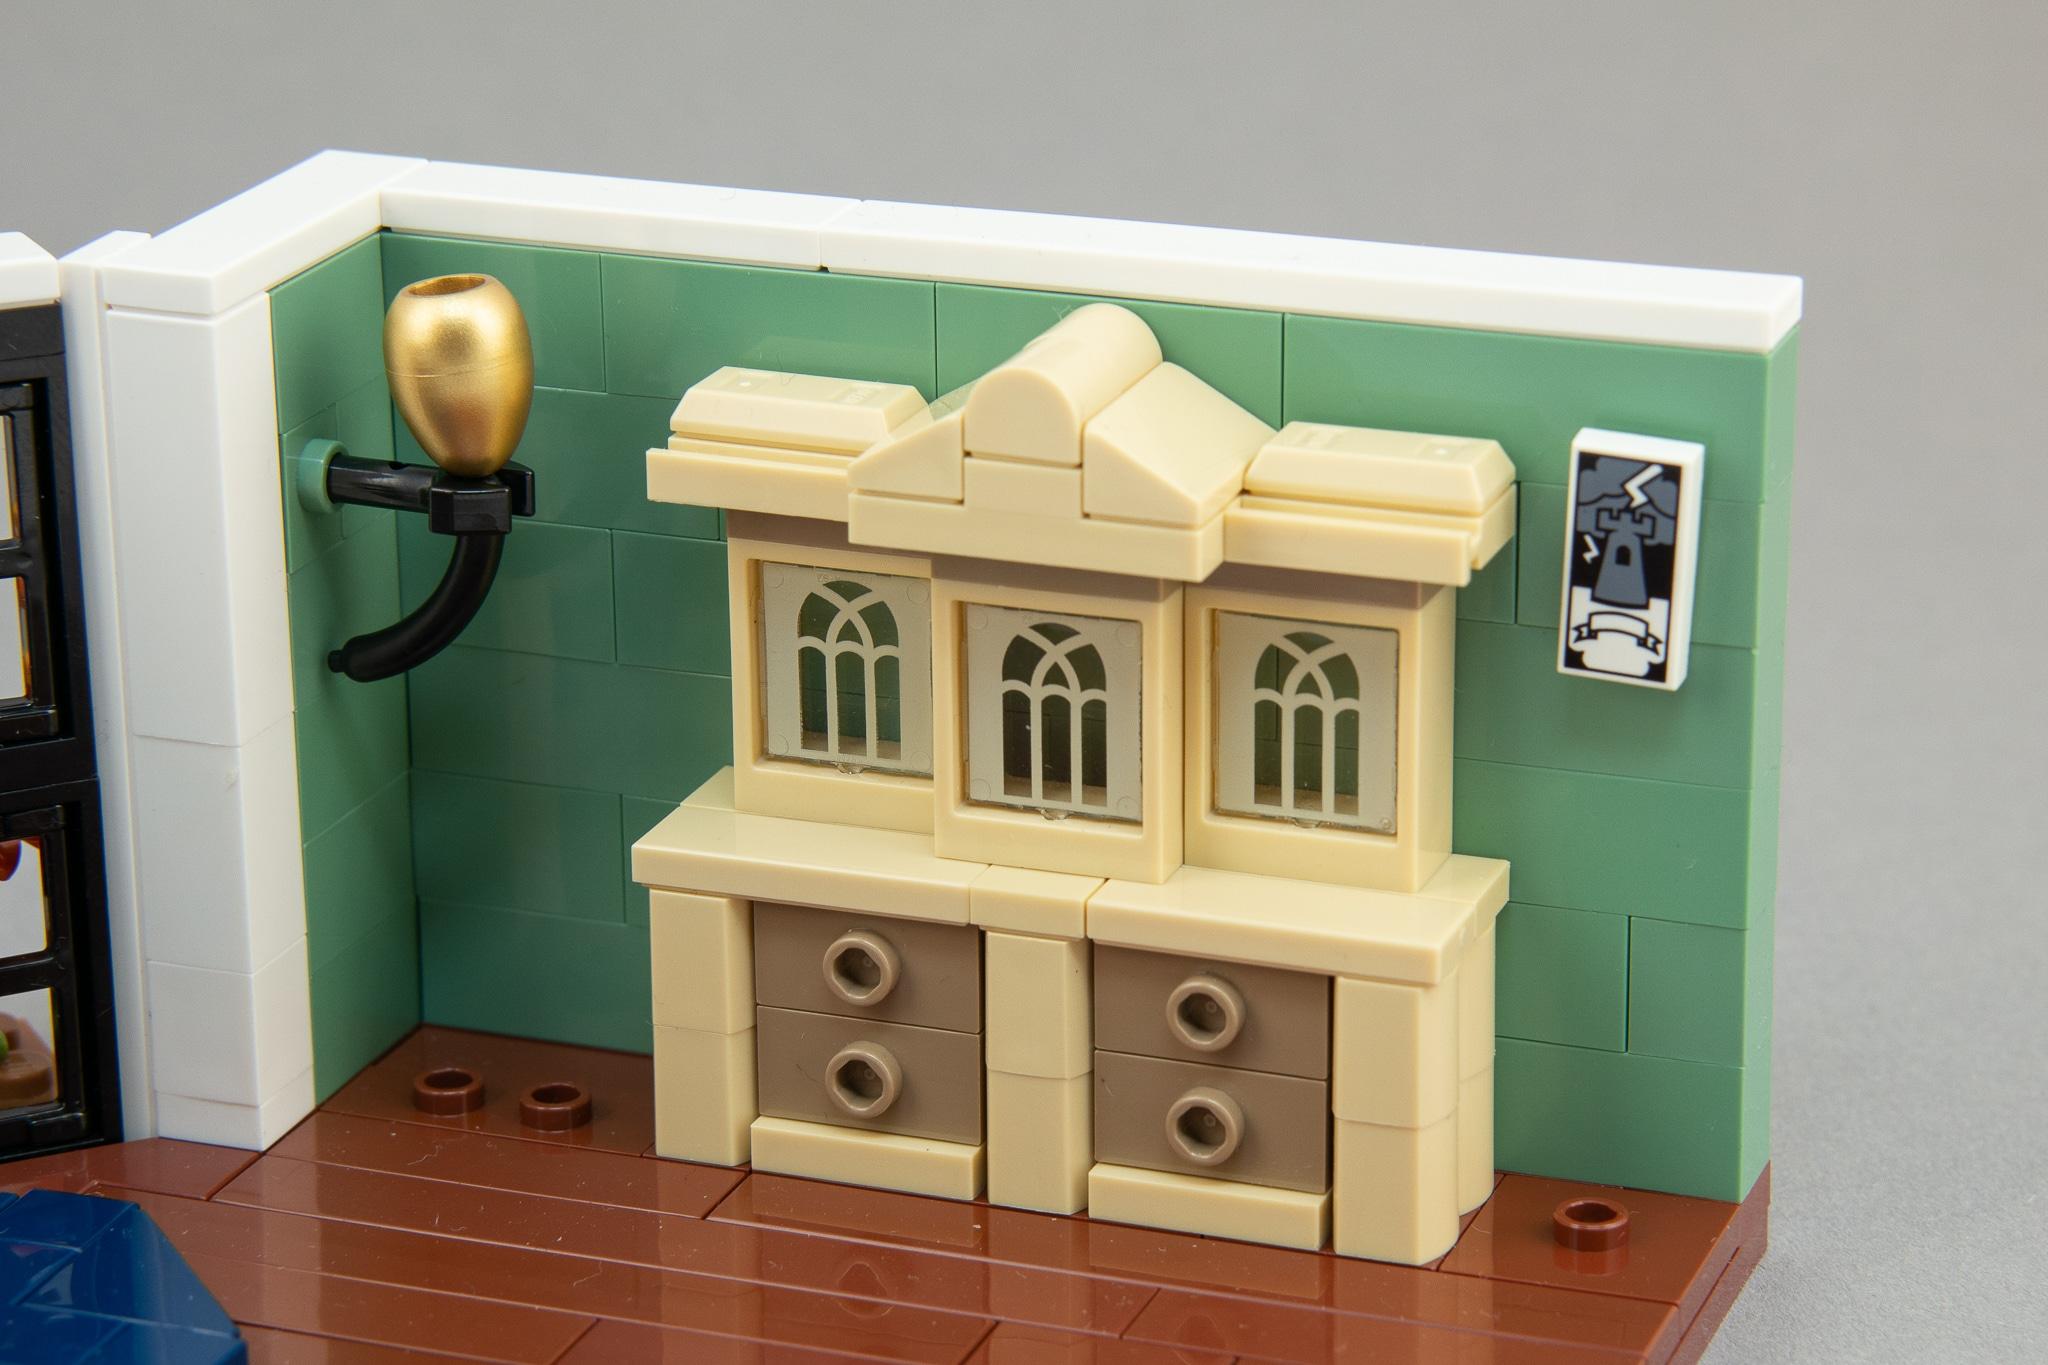 LEGO Moc Bausinpiration Esszimmer (13)